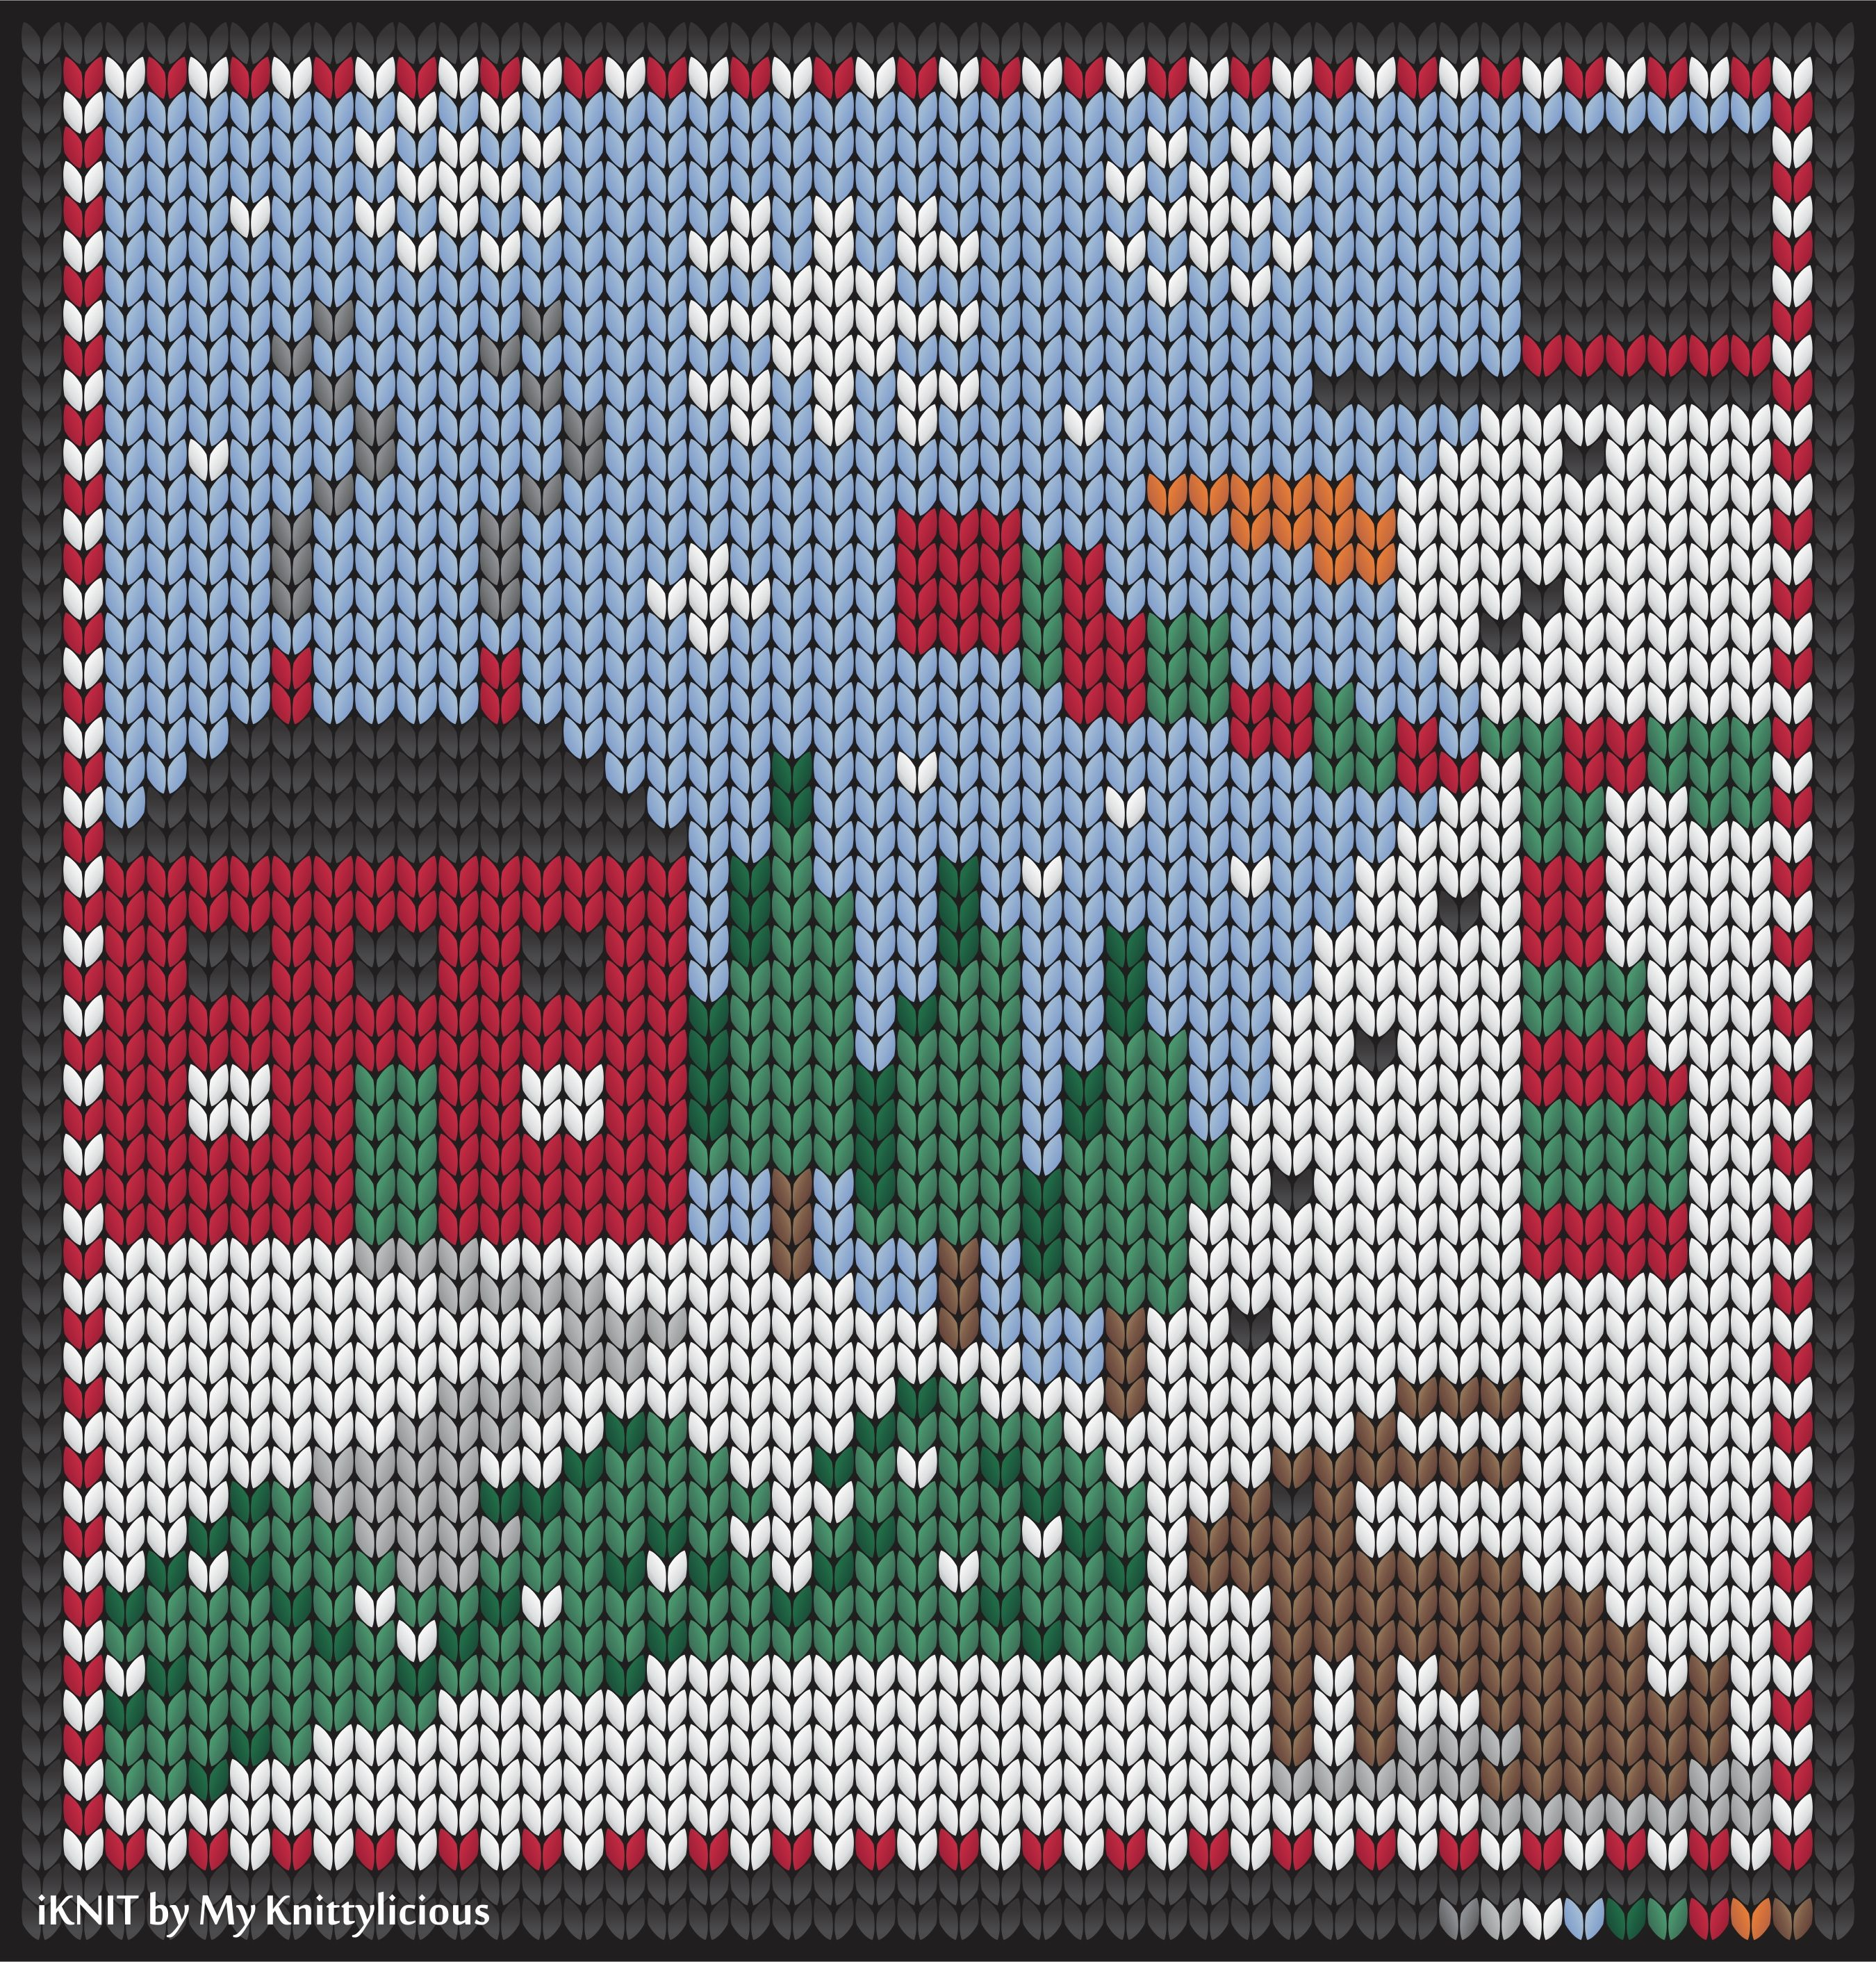 Winter knitting pattern with Snowman | Christmas knitting ...